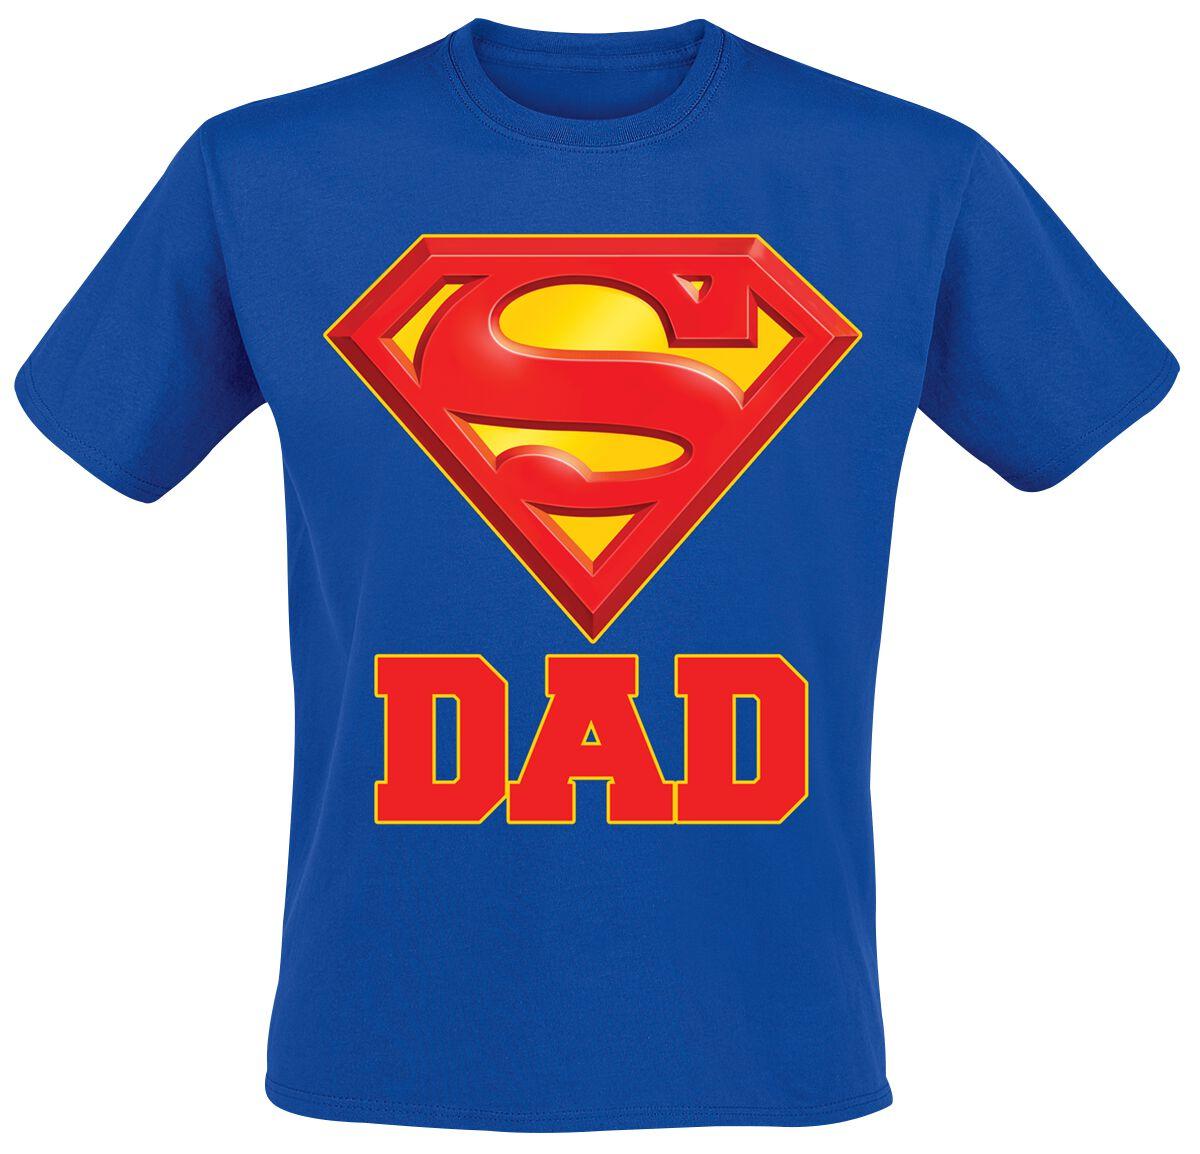 41a7231c Superman Full Sleeve T Shirt Online - DREAMWORKS